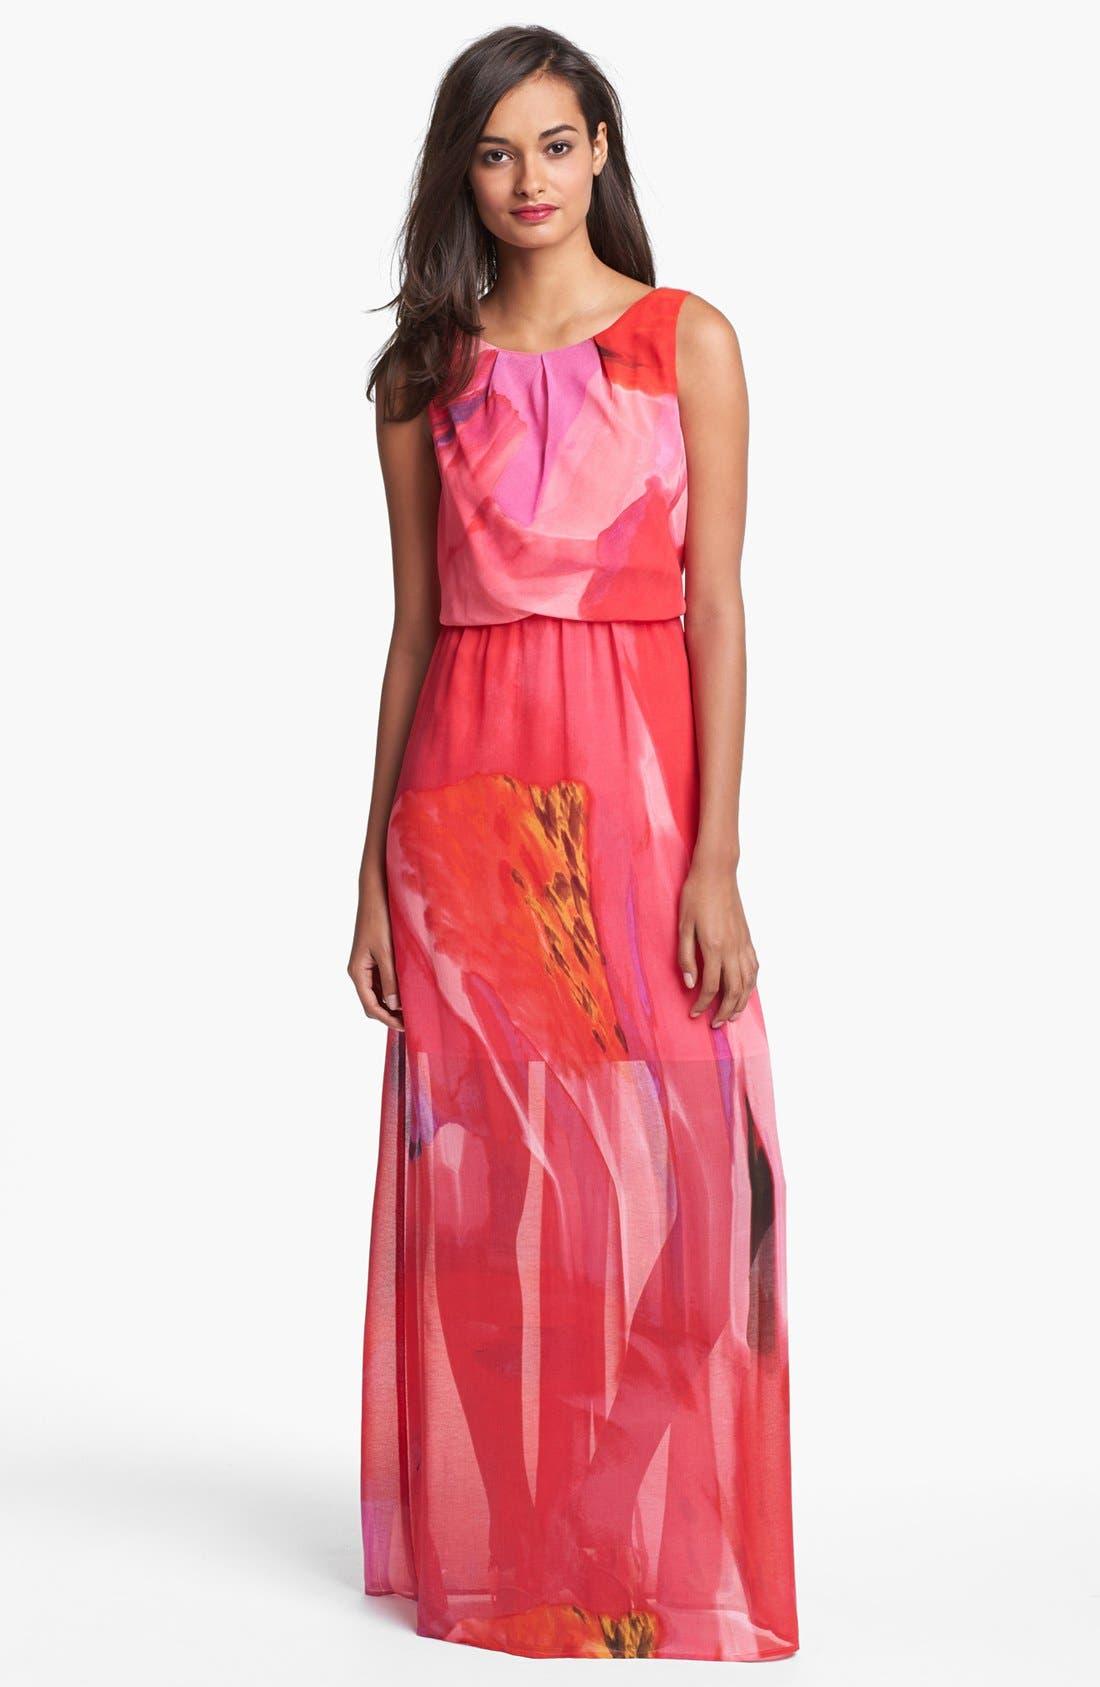 Main Image - Vince Camuto Blouson Print Chiffon Maxi Dress